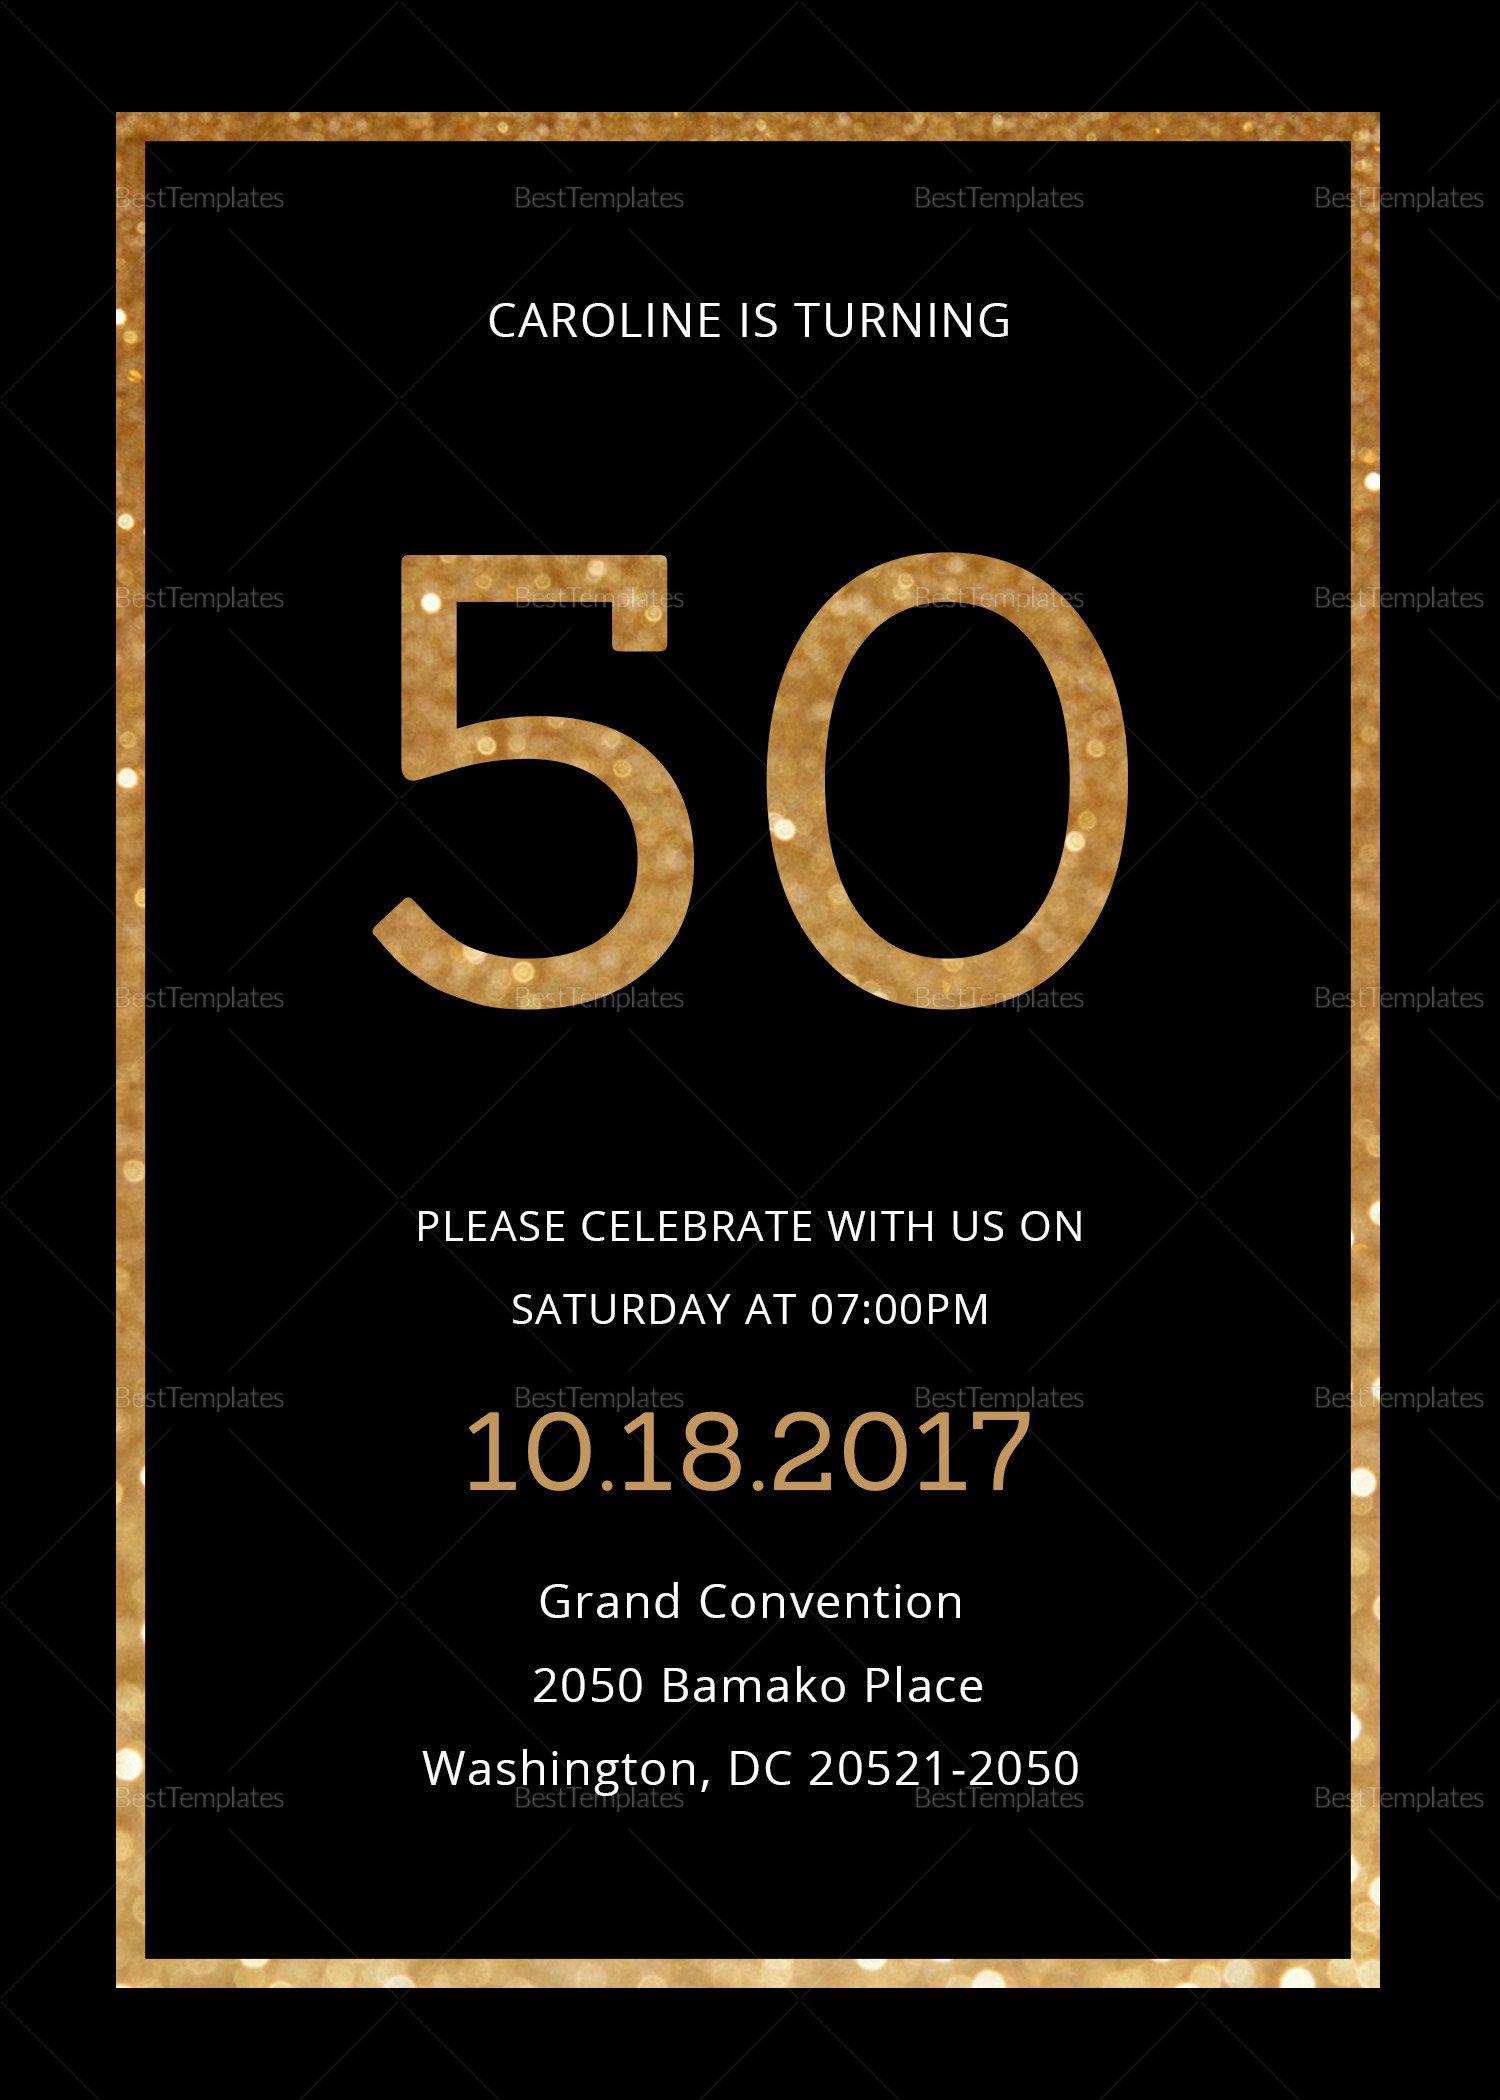 Black and Gold Invitation Template Elegant Black and Gold 50th Birthday Invitation Design